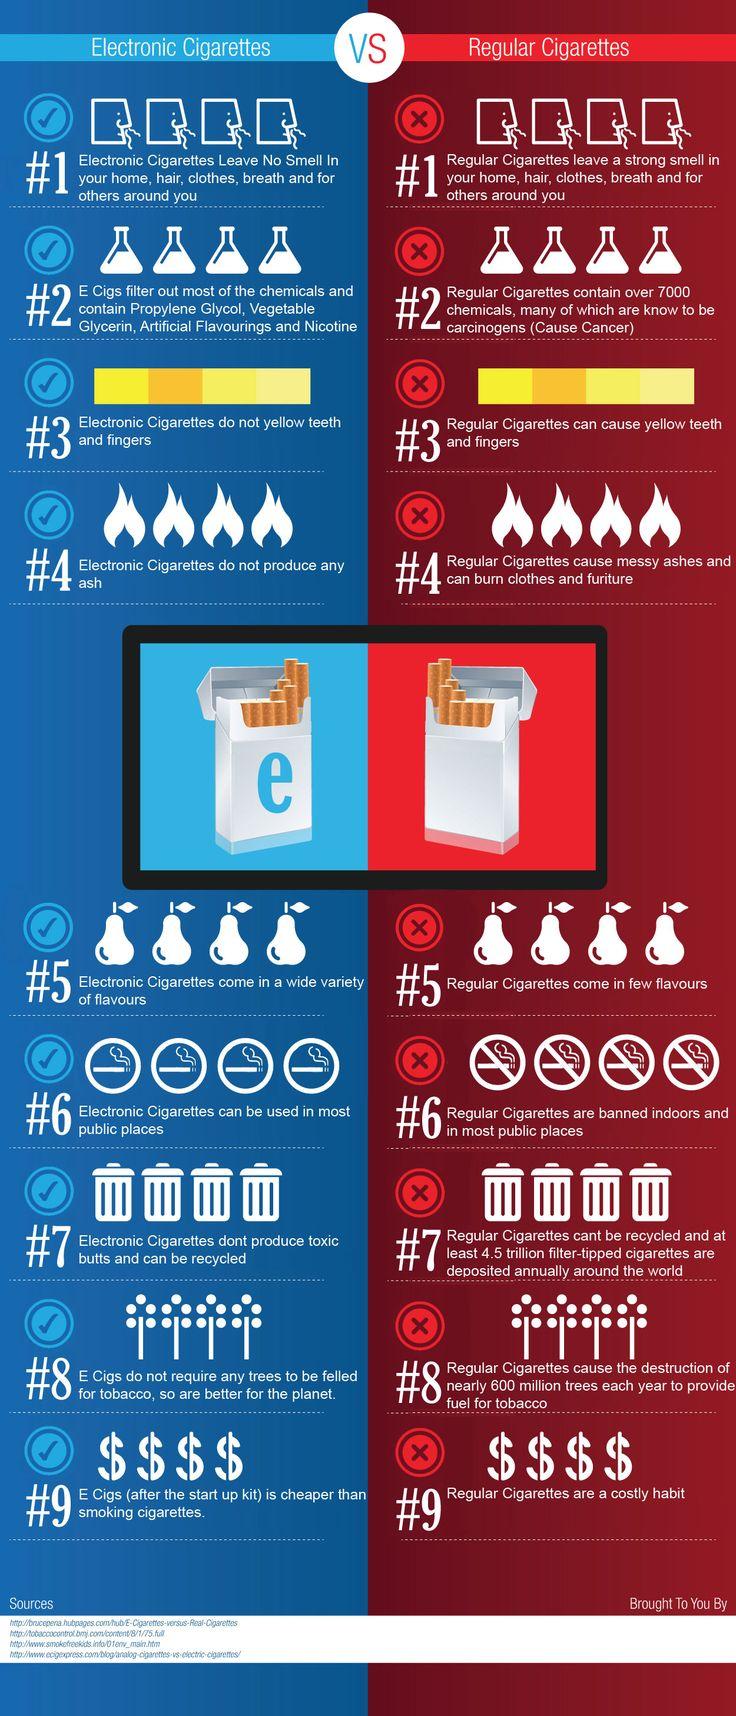 Electronic Cigarettes vs Regular Cigarettes